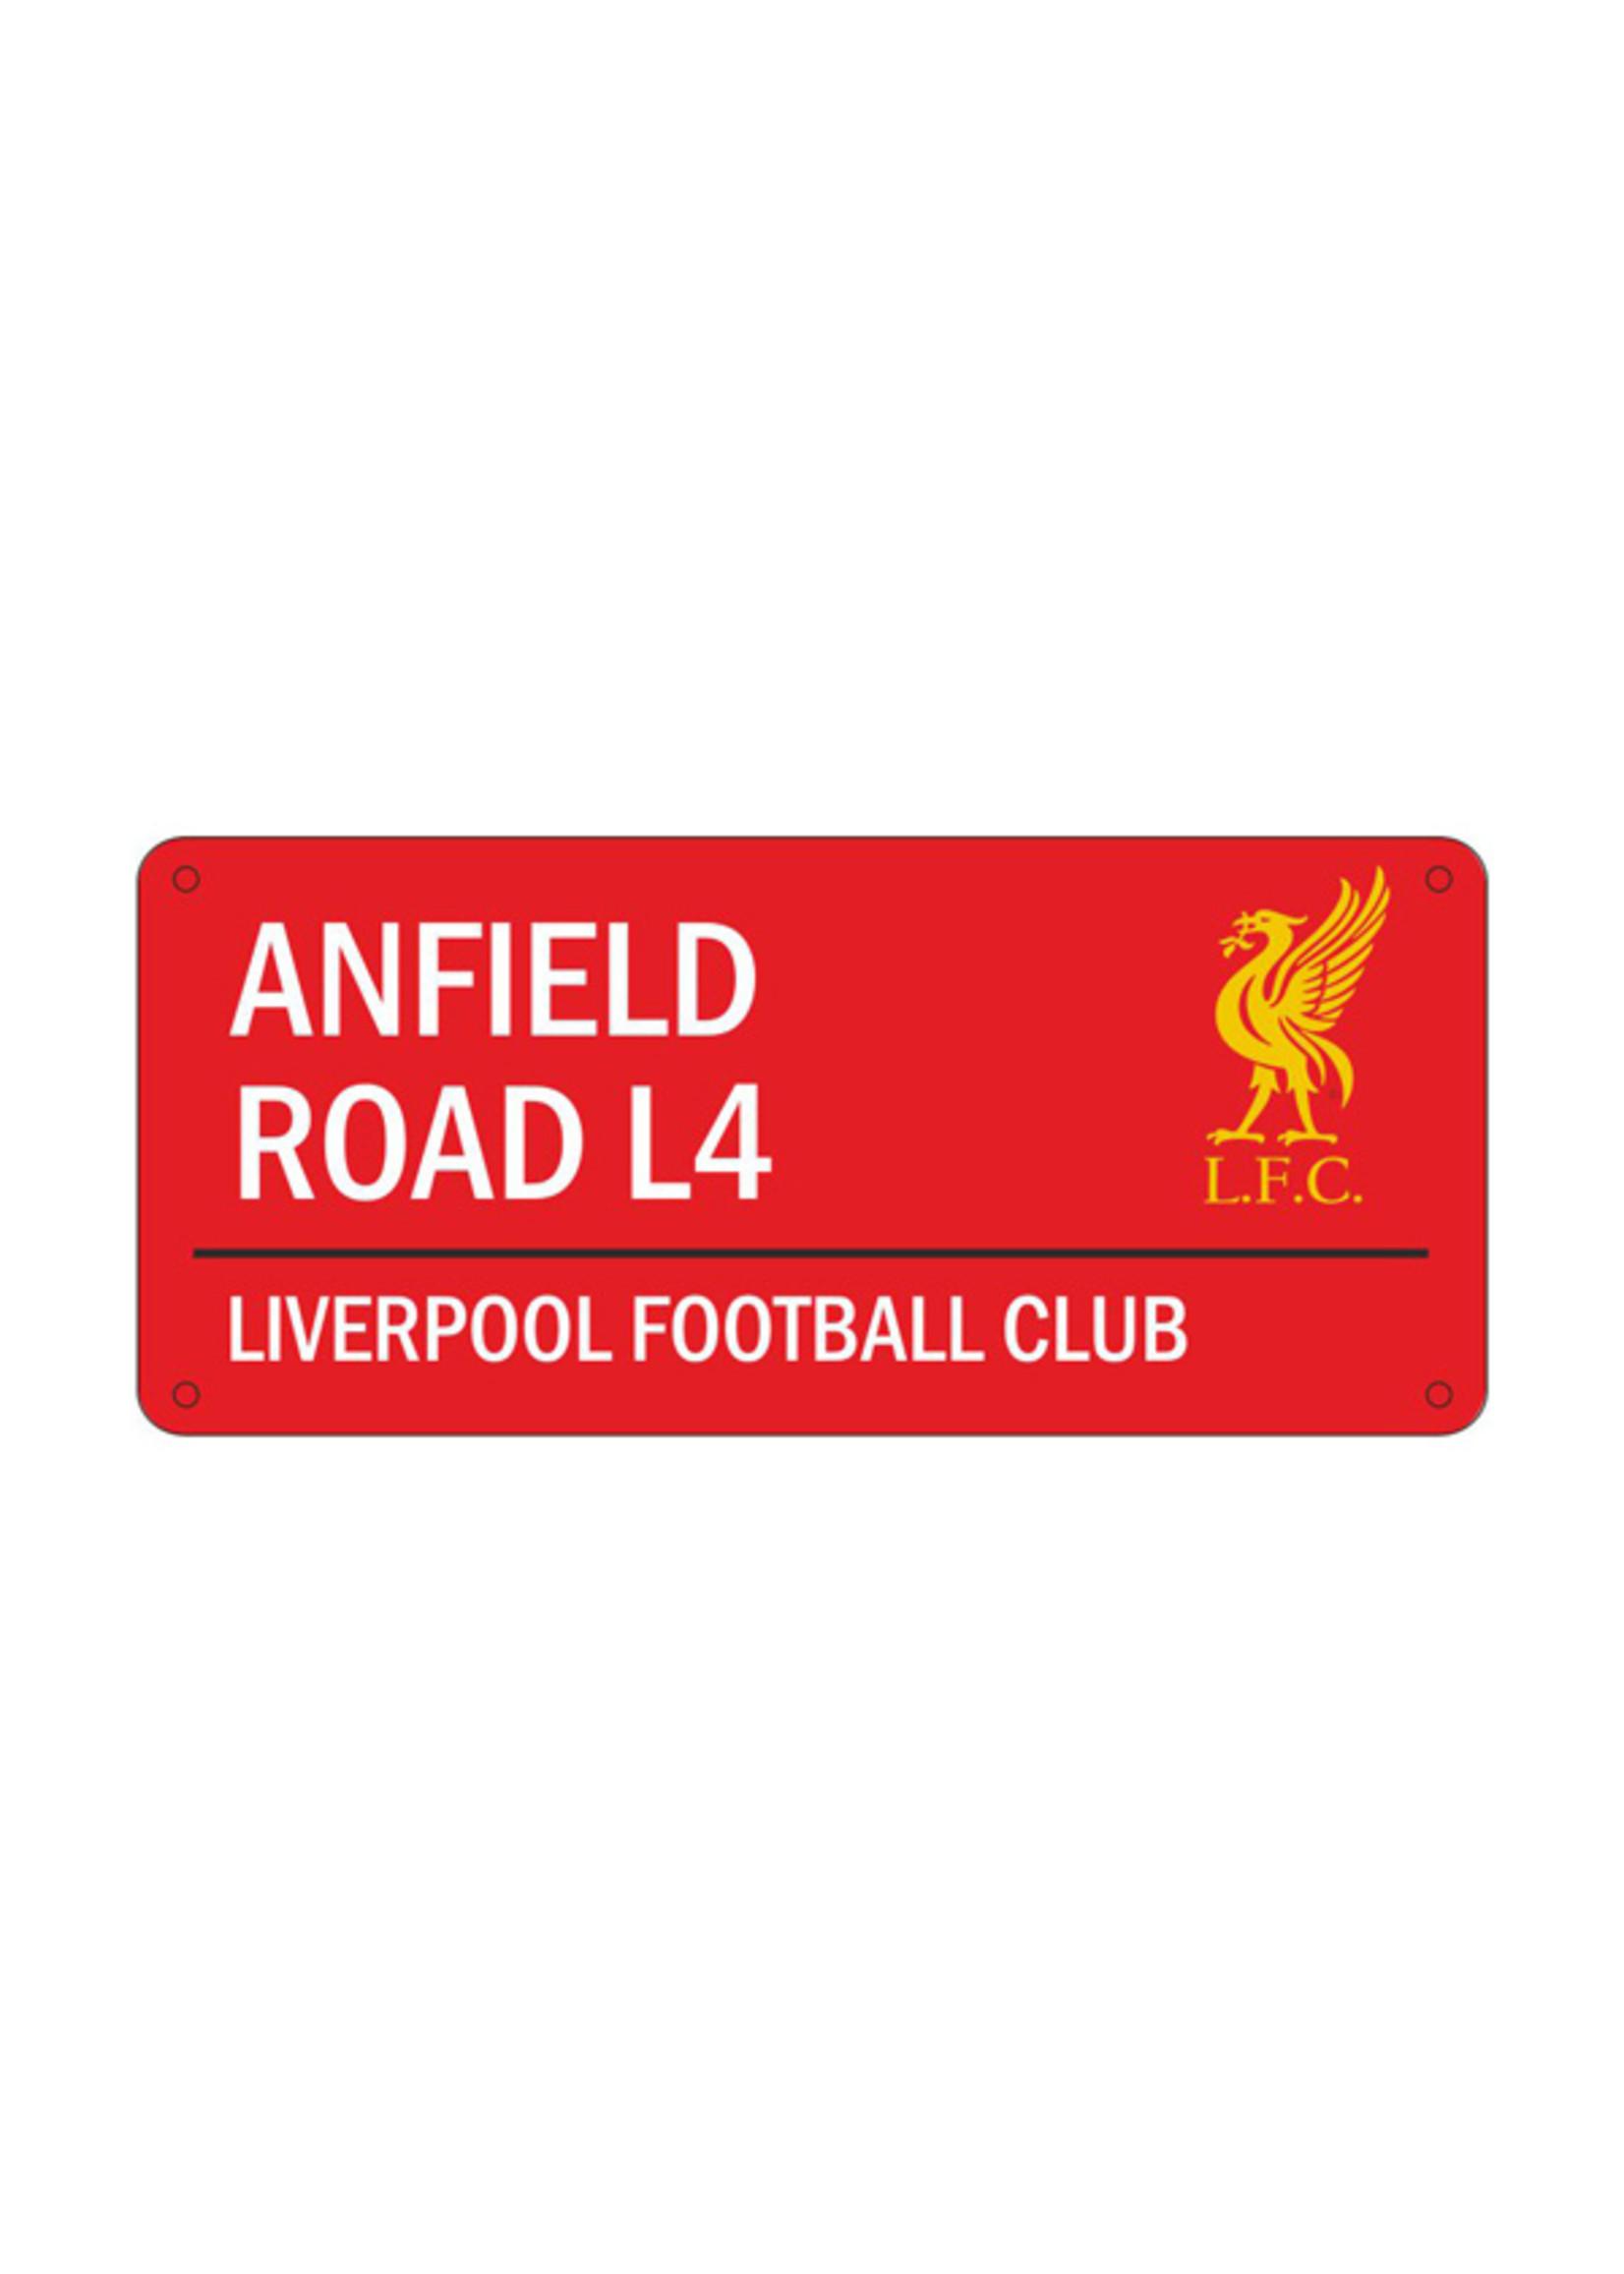 Liverpool Anfield Road L4 Street Sign